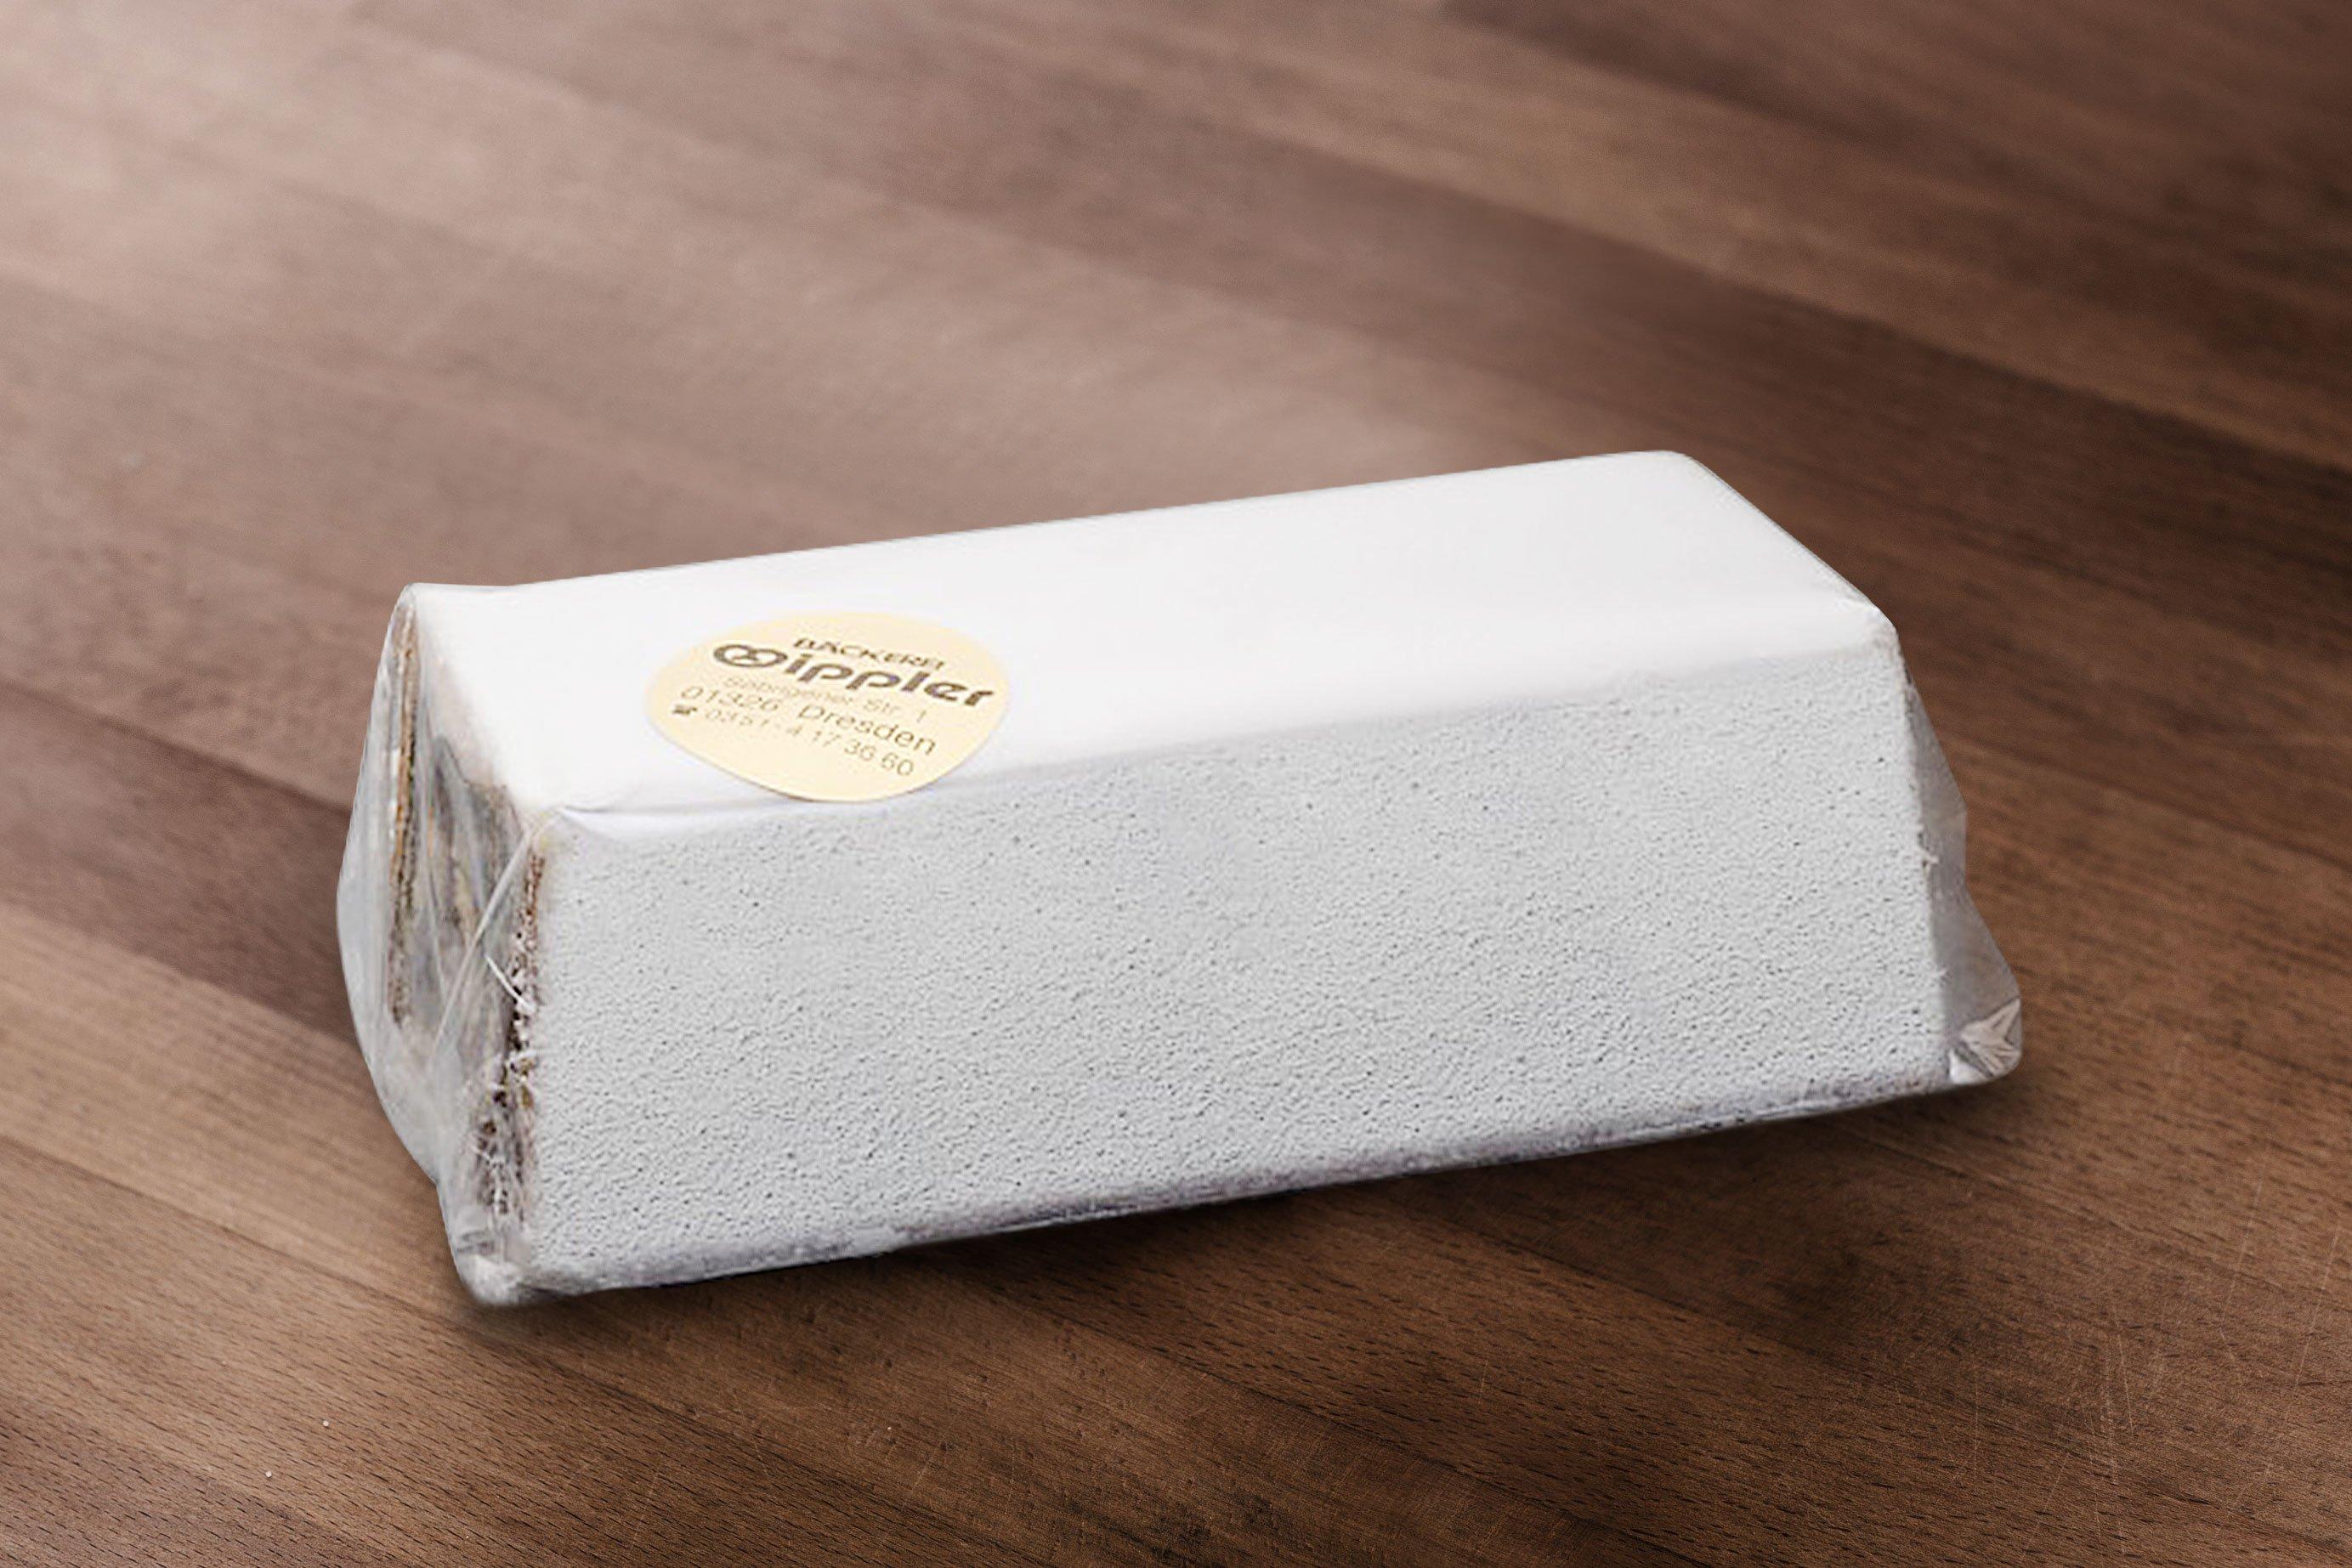 Wipplers Butter-Mohnstollen 500g